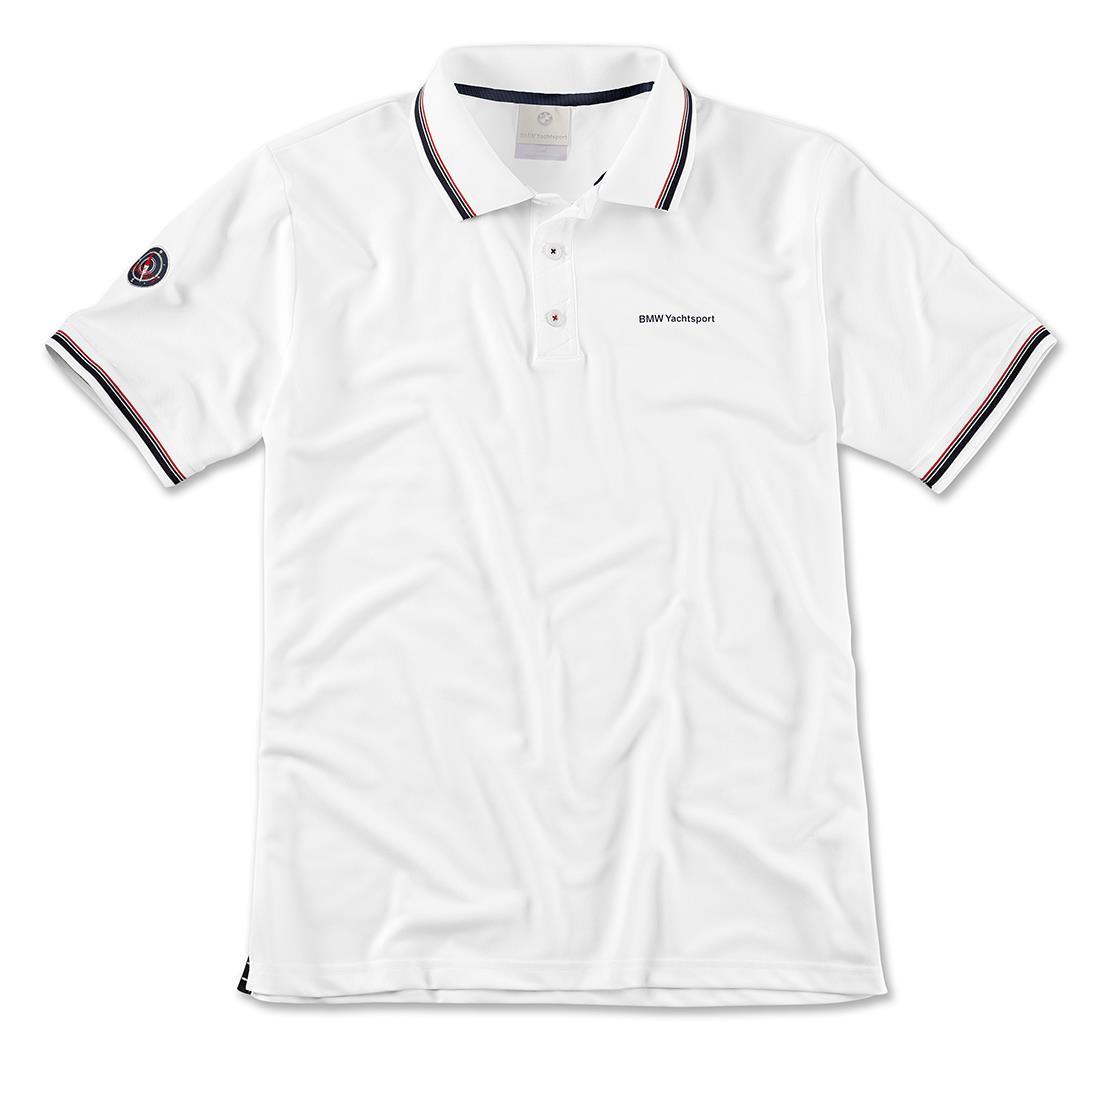 BMW Yachtsport Men's Poloshirt